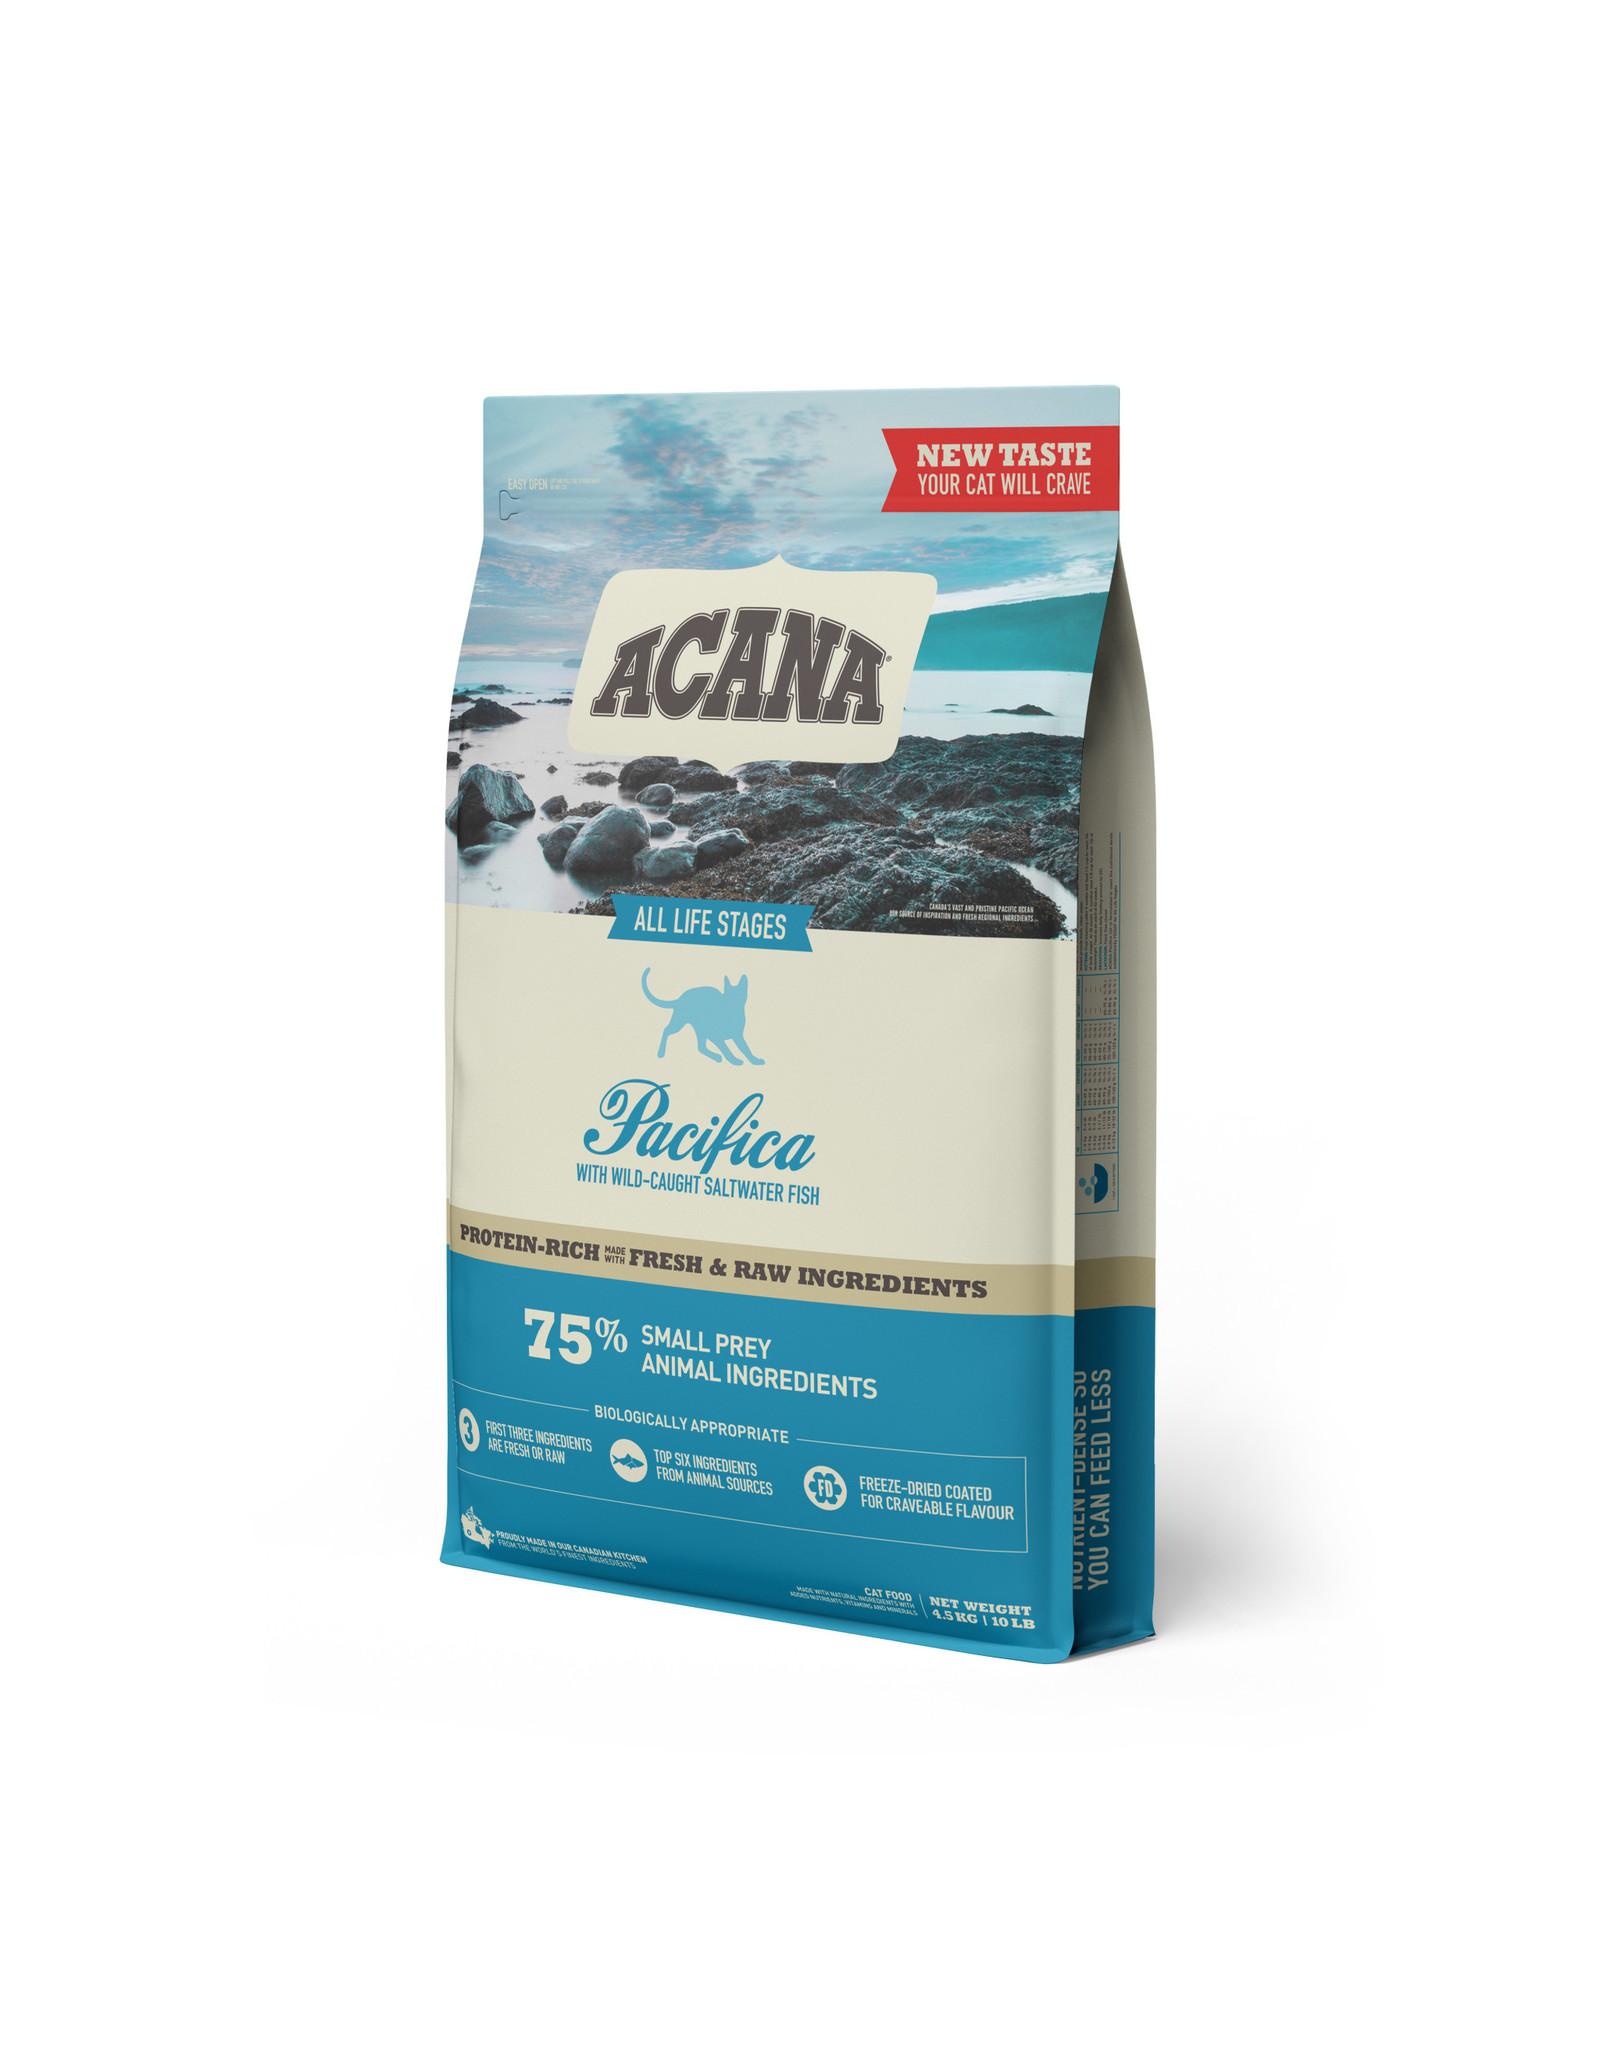 Acana Acana Pacifica [CAT]